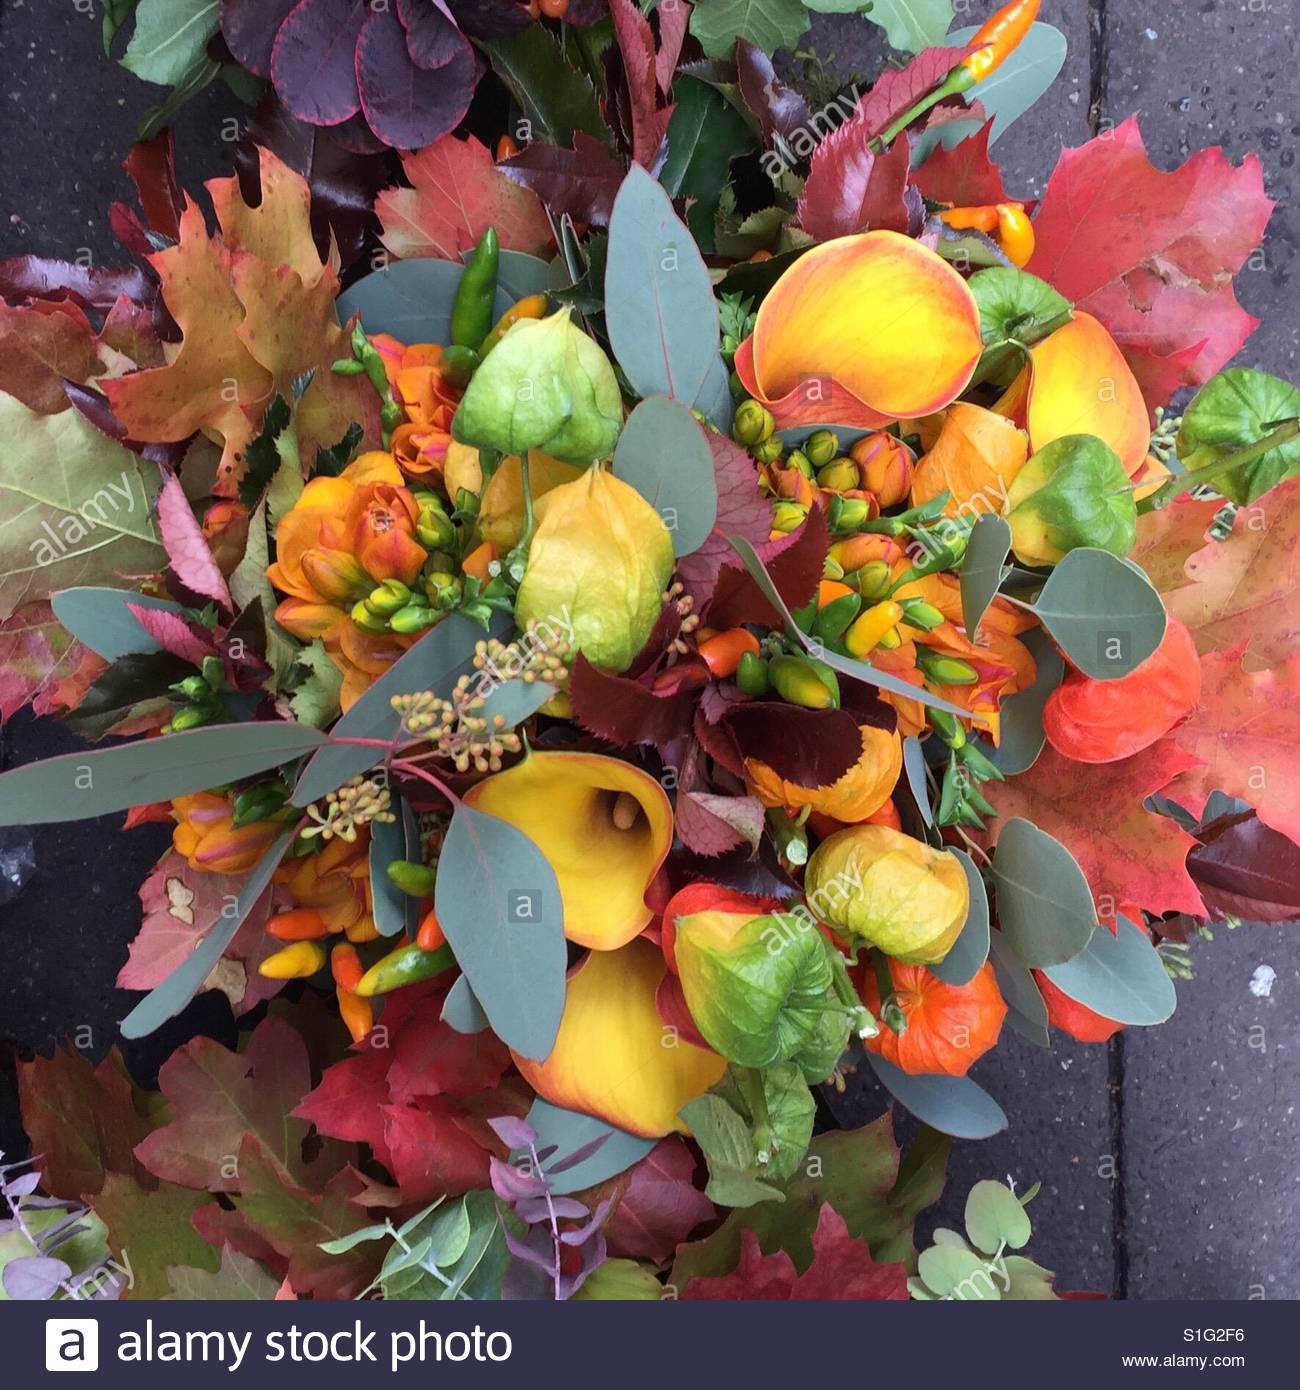 Fall Flower Bouquet From Parisian Market France Stock Photo